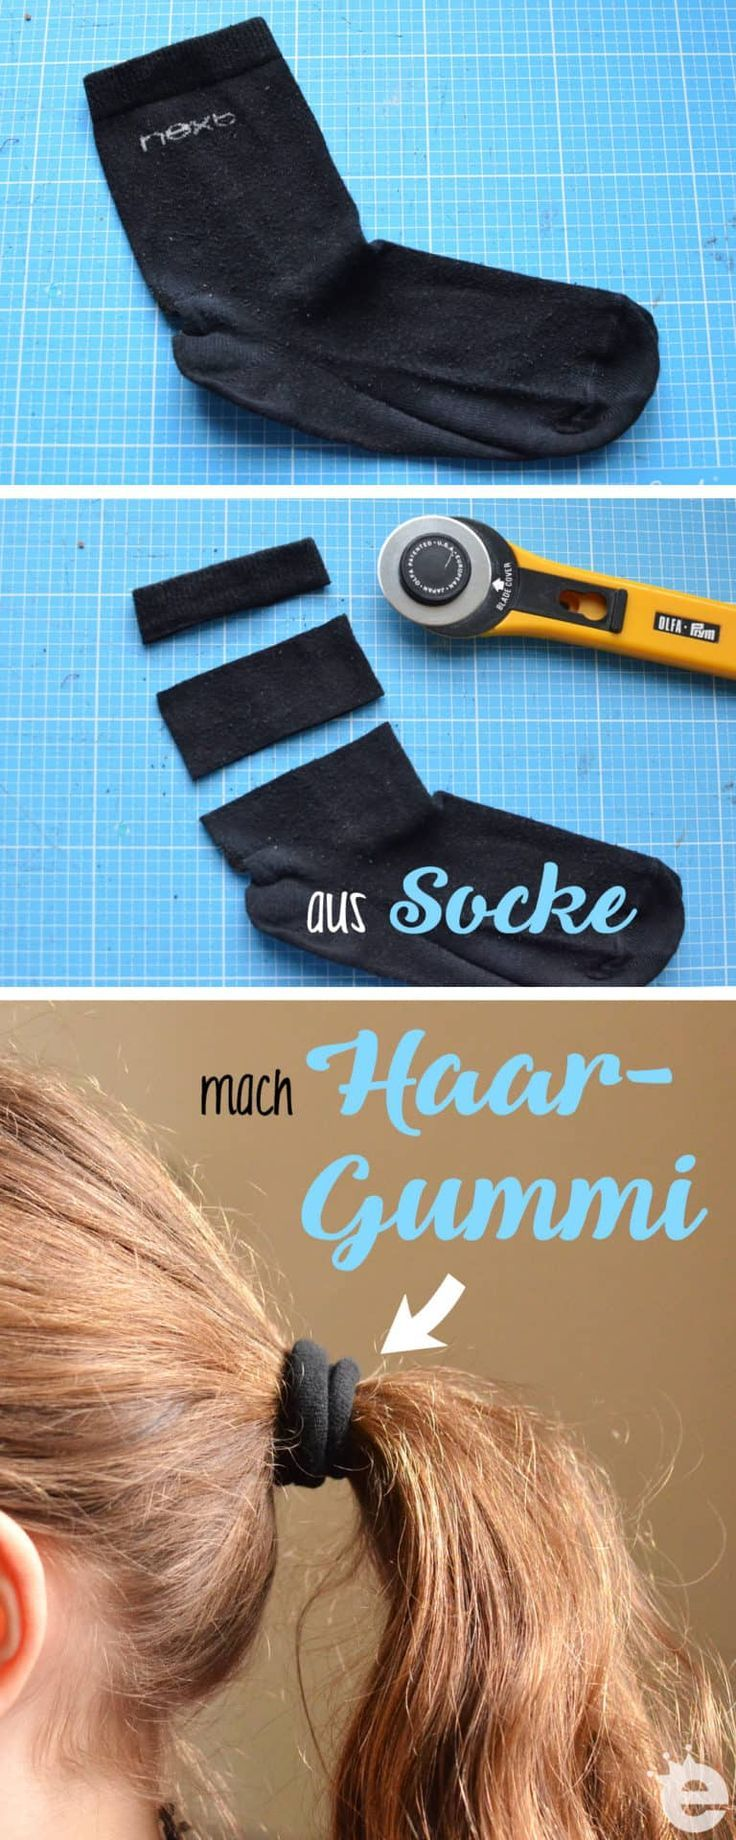 Socken-Upcycling-Ideen: Puppenmützen und Haargummis #dollhats